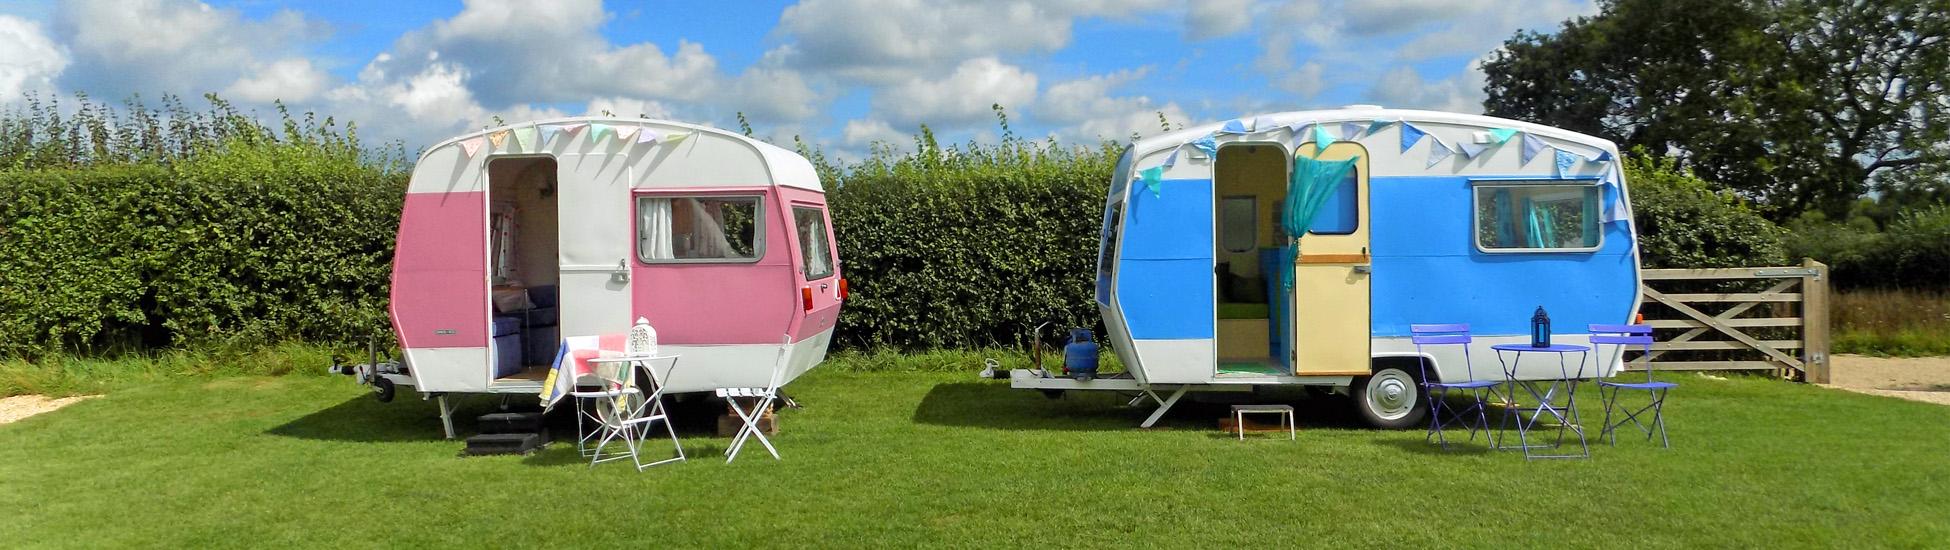 2 caravans